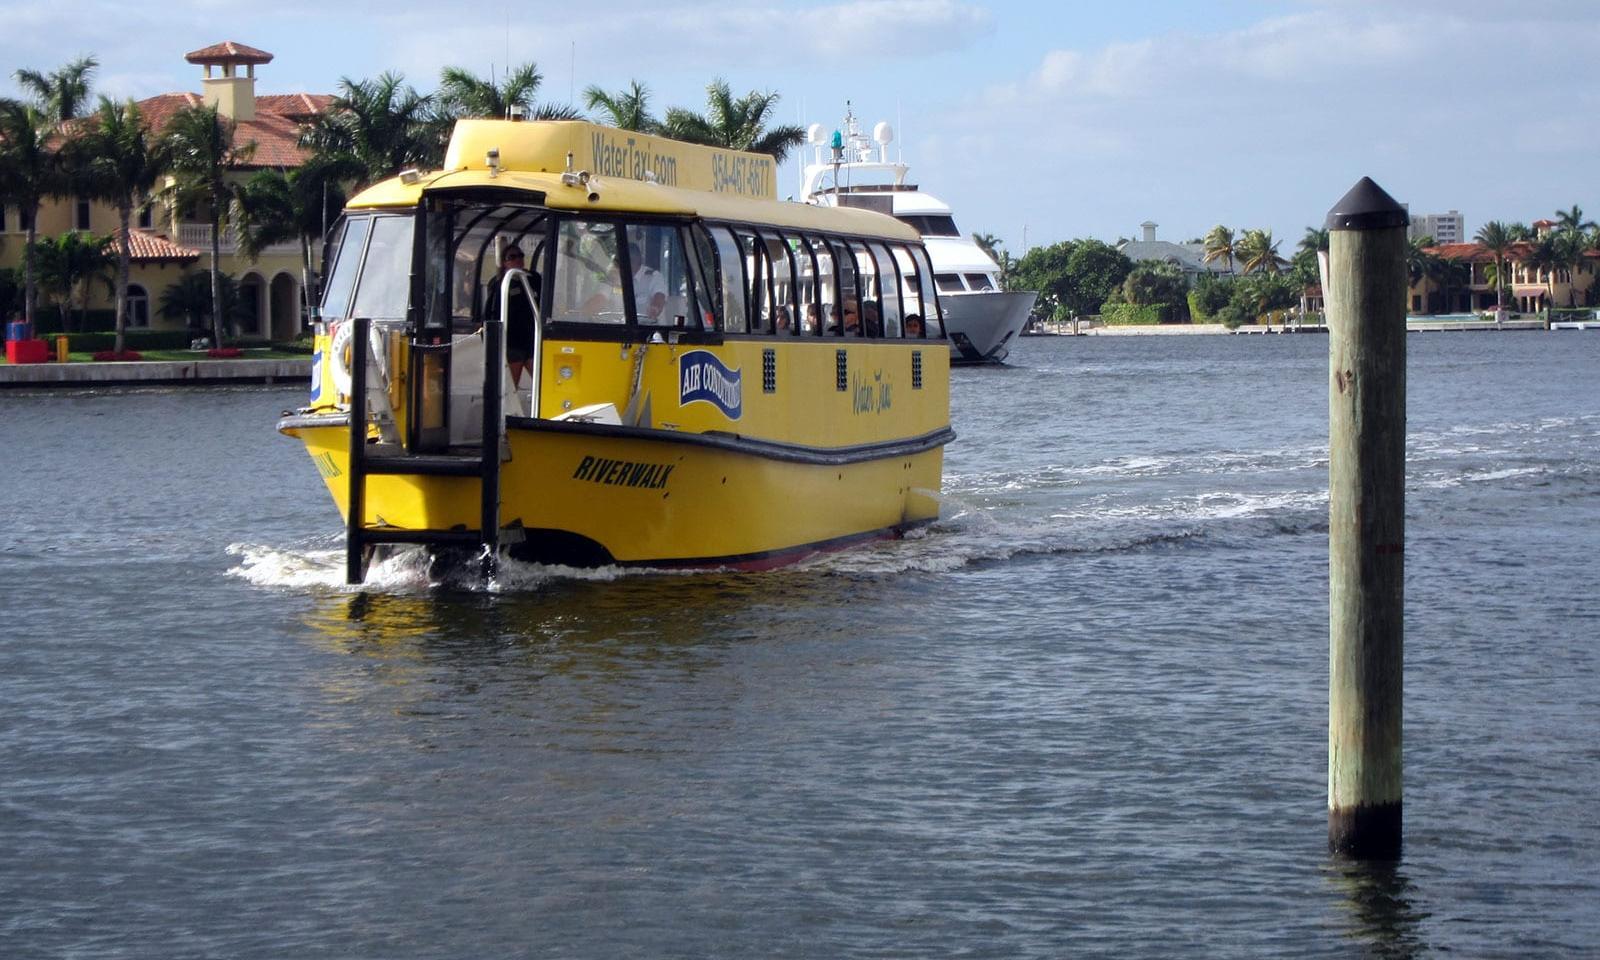 Fort_Lauderdale4